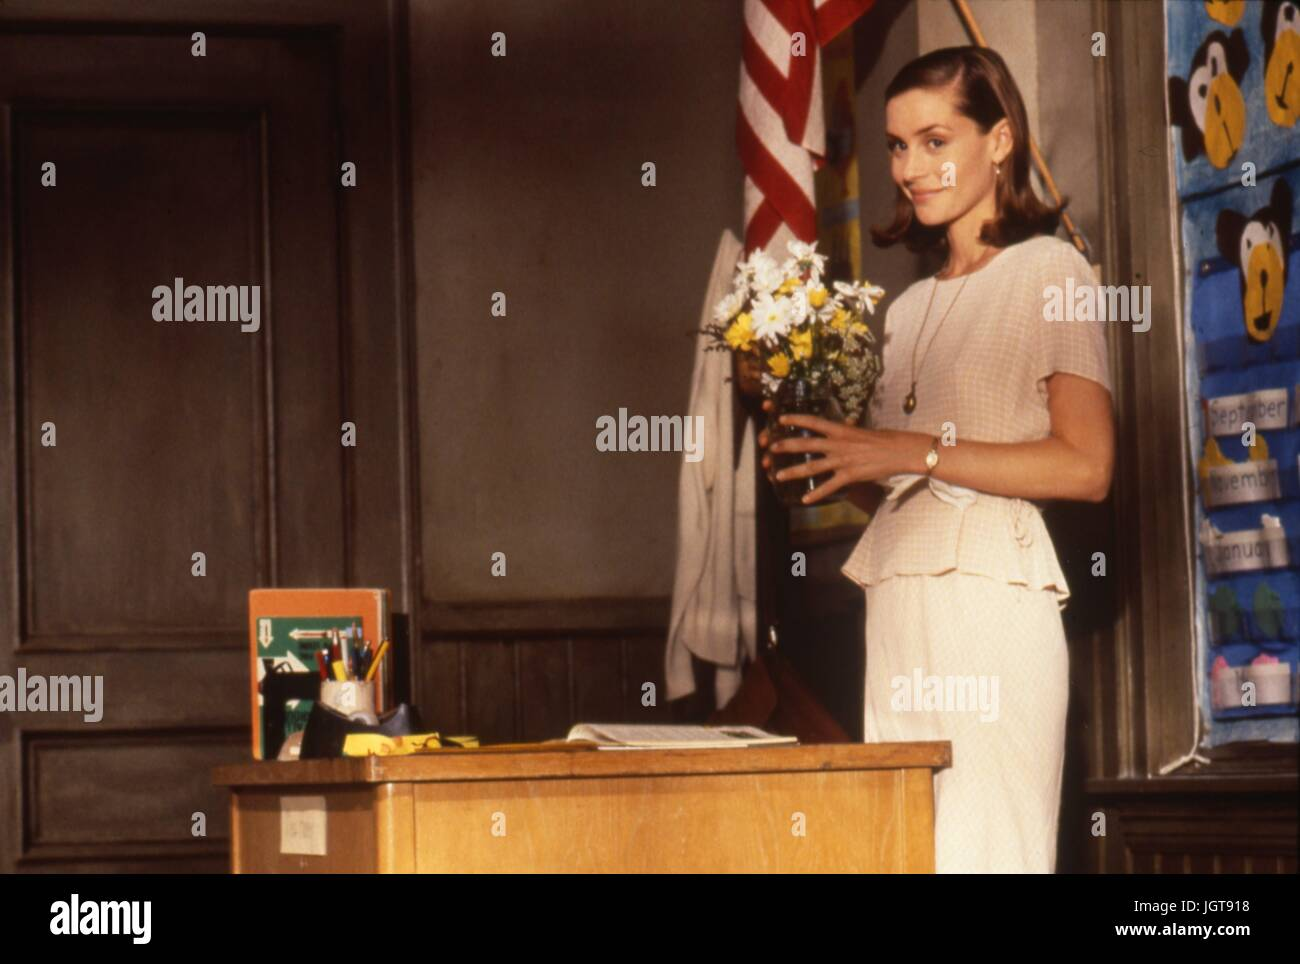 Matilda Year : 1996 USA Director : Danny DeVito Embeth